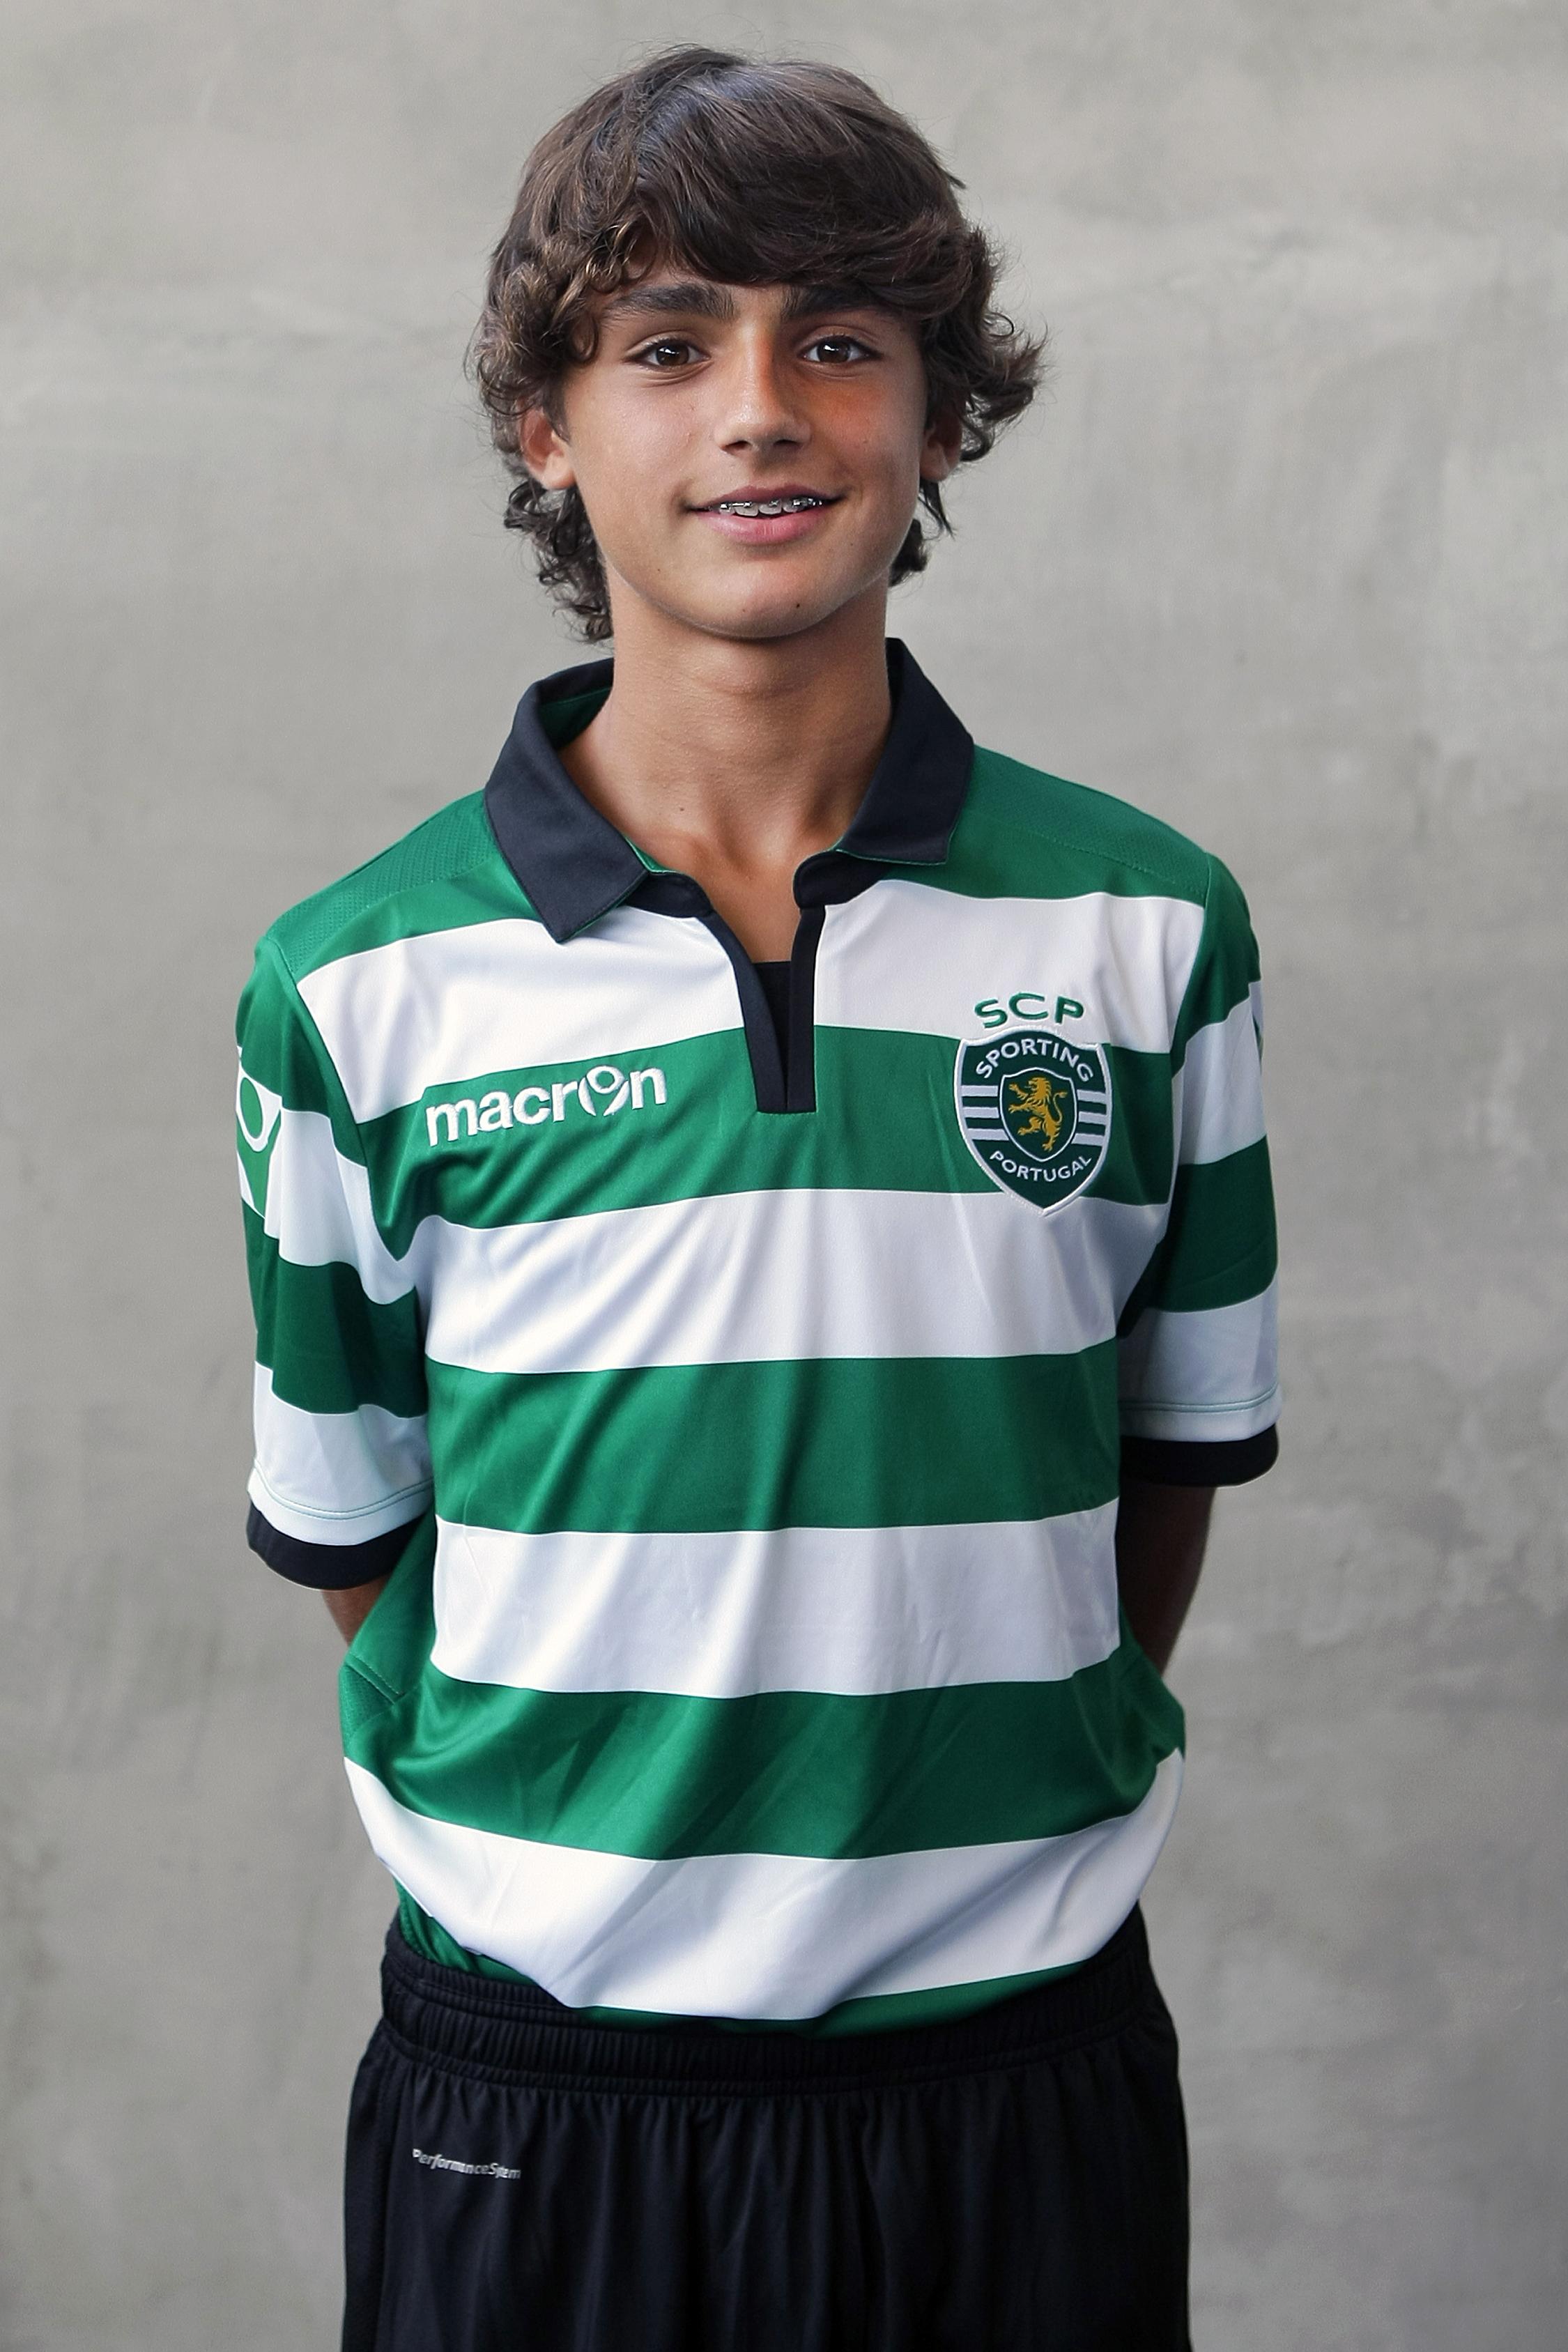 Tiago Filipe Prazeres Ferreira